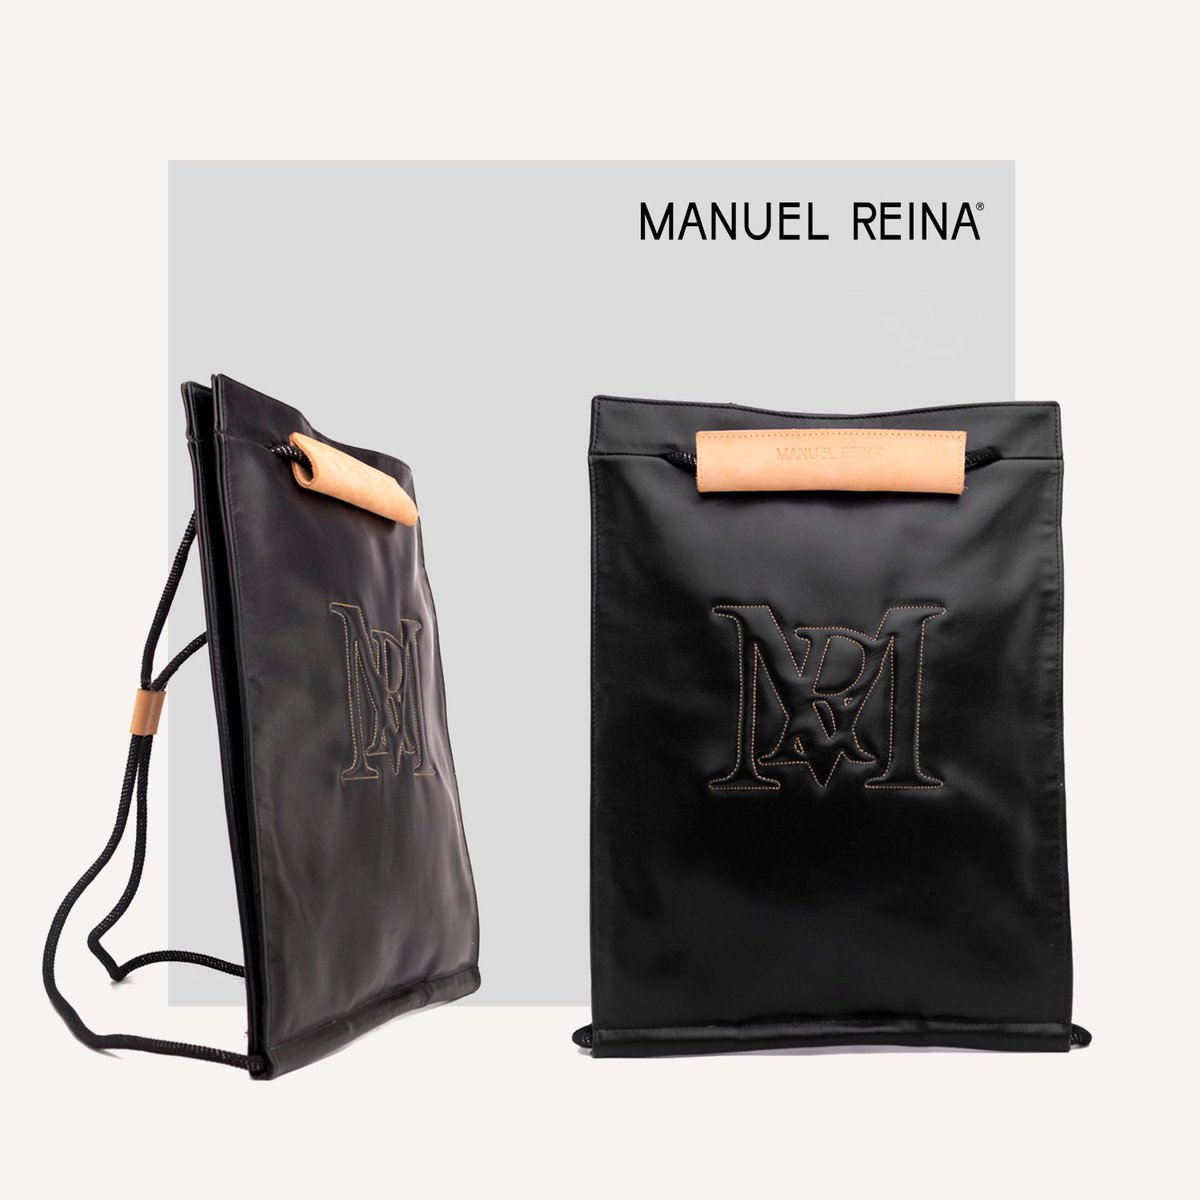 👛 The fashion of your dreams ❤️•#bag #bags #handbag #tas #shoes #กระเป #clutch #leather #backpack #hermes #fashionbag #tasmurah #accessories #tasimport #slingbag #wallet #totebag #jualtas #leatherbag #shoulderbag #ขาย #tasbagus #tasbranded #sale #taswanita #chanel #purse